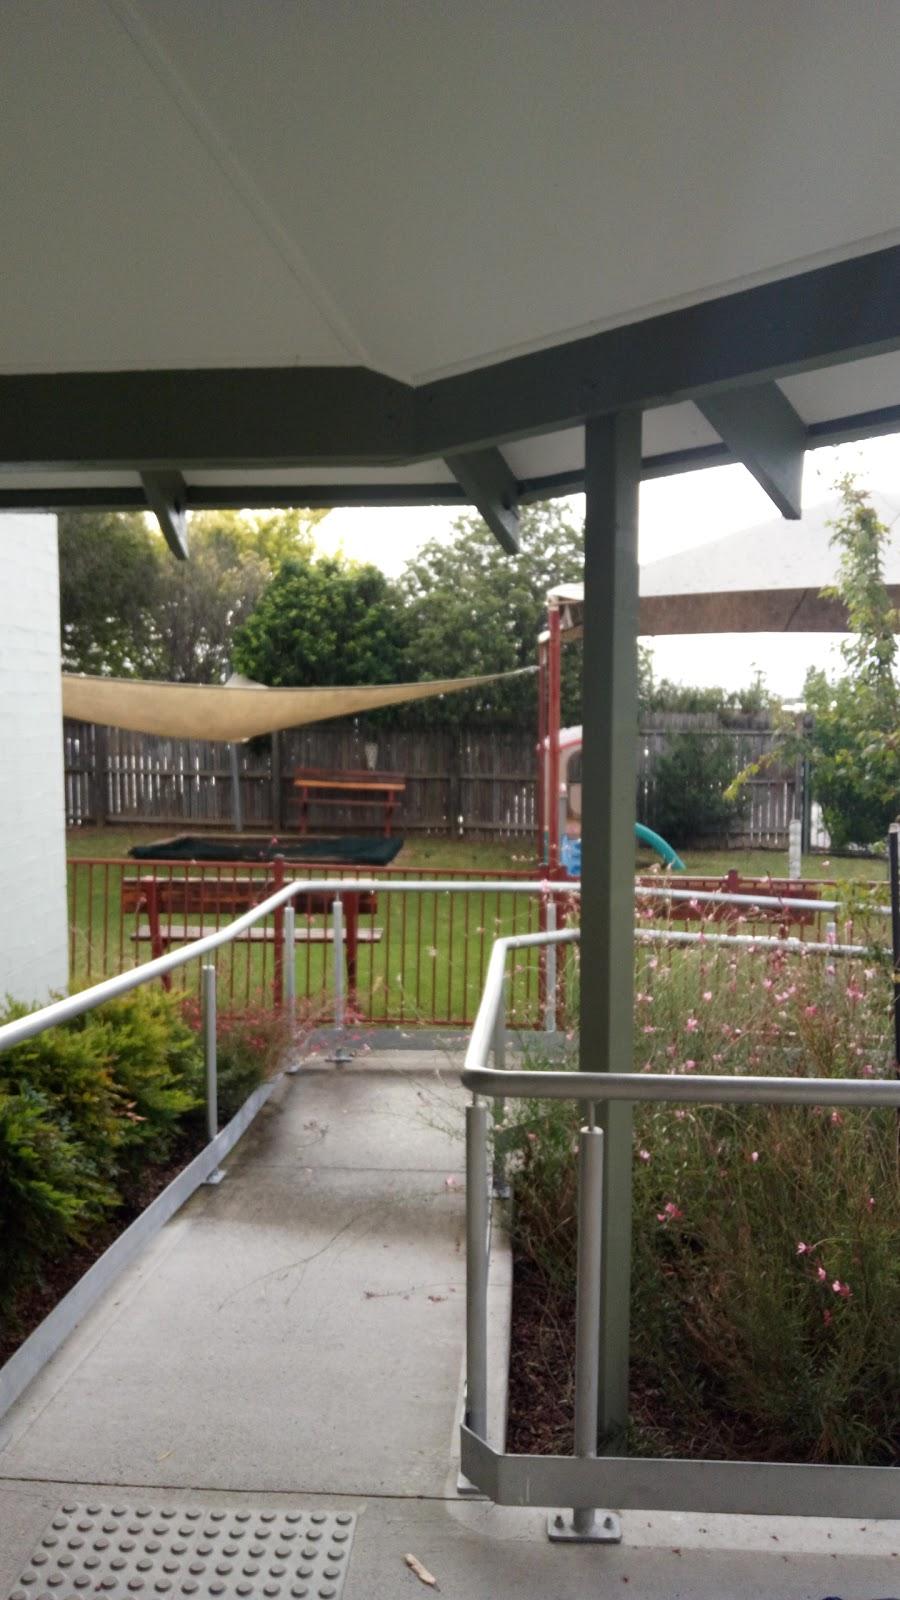 Oak Flats Anglican Church | church | 35 Fisher St, Oak Flats NSW 2529, Australia | 0242566464 OR +61 2 4256 6464